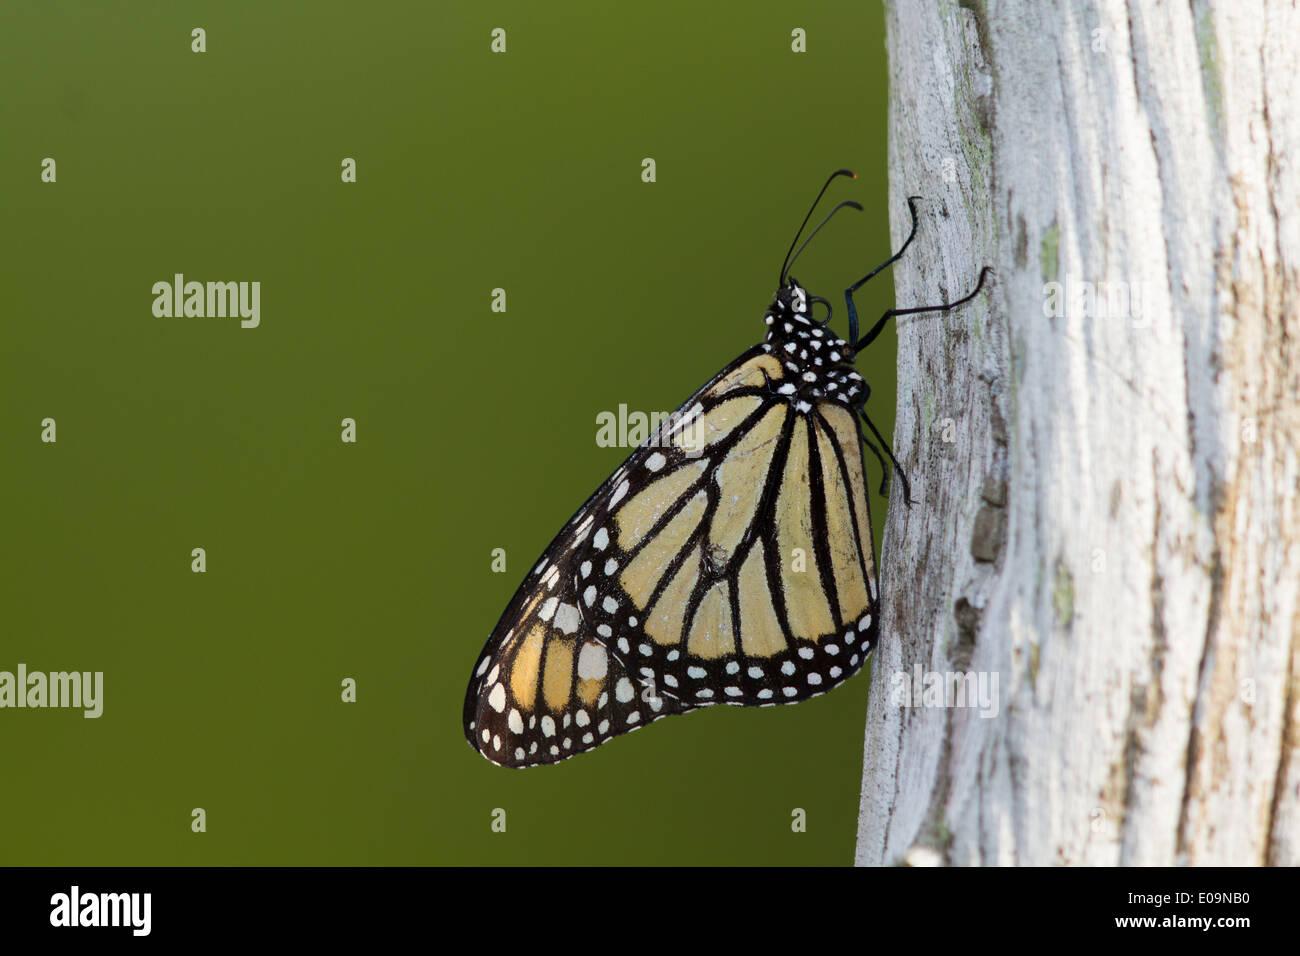 Monarch butterfly (Danaus plexippus) resting on a fencepost - Stock Image